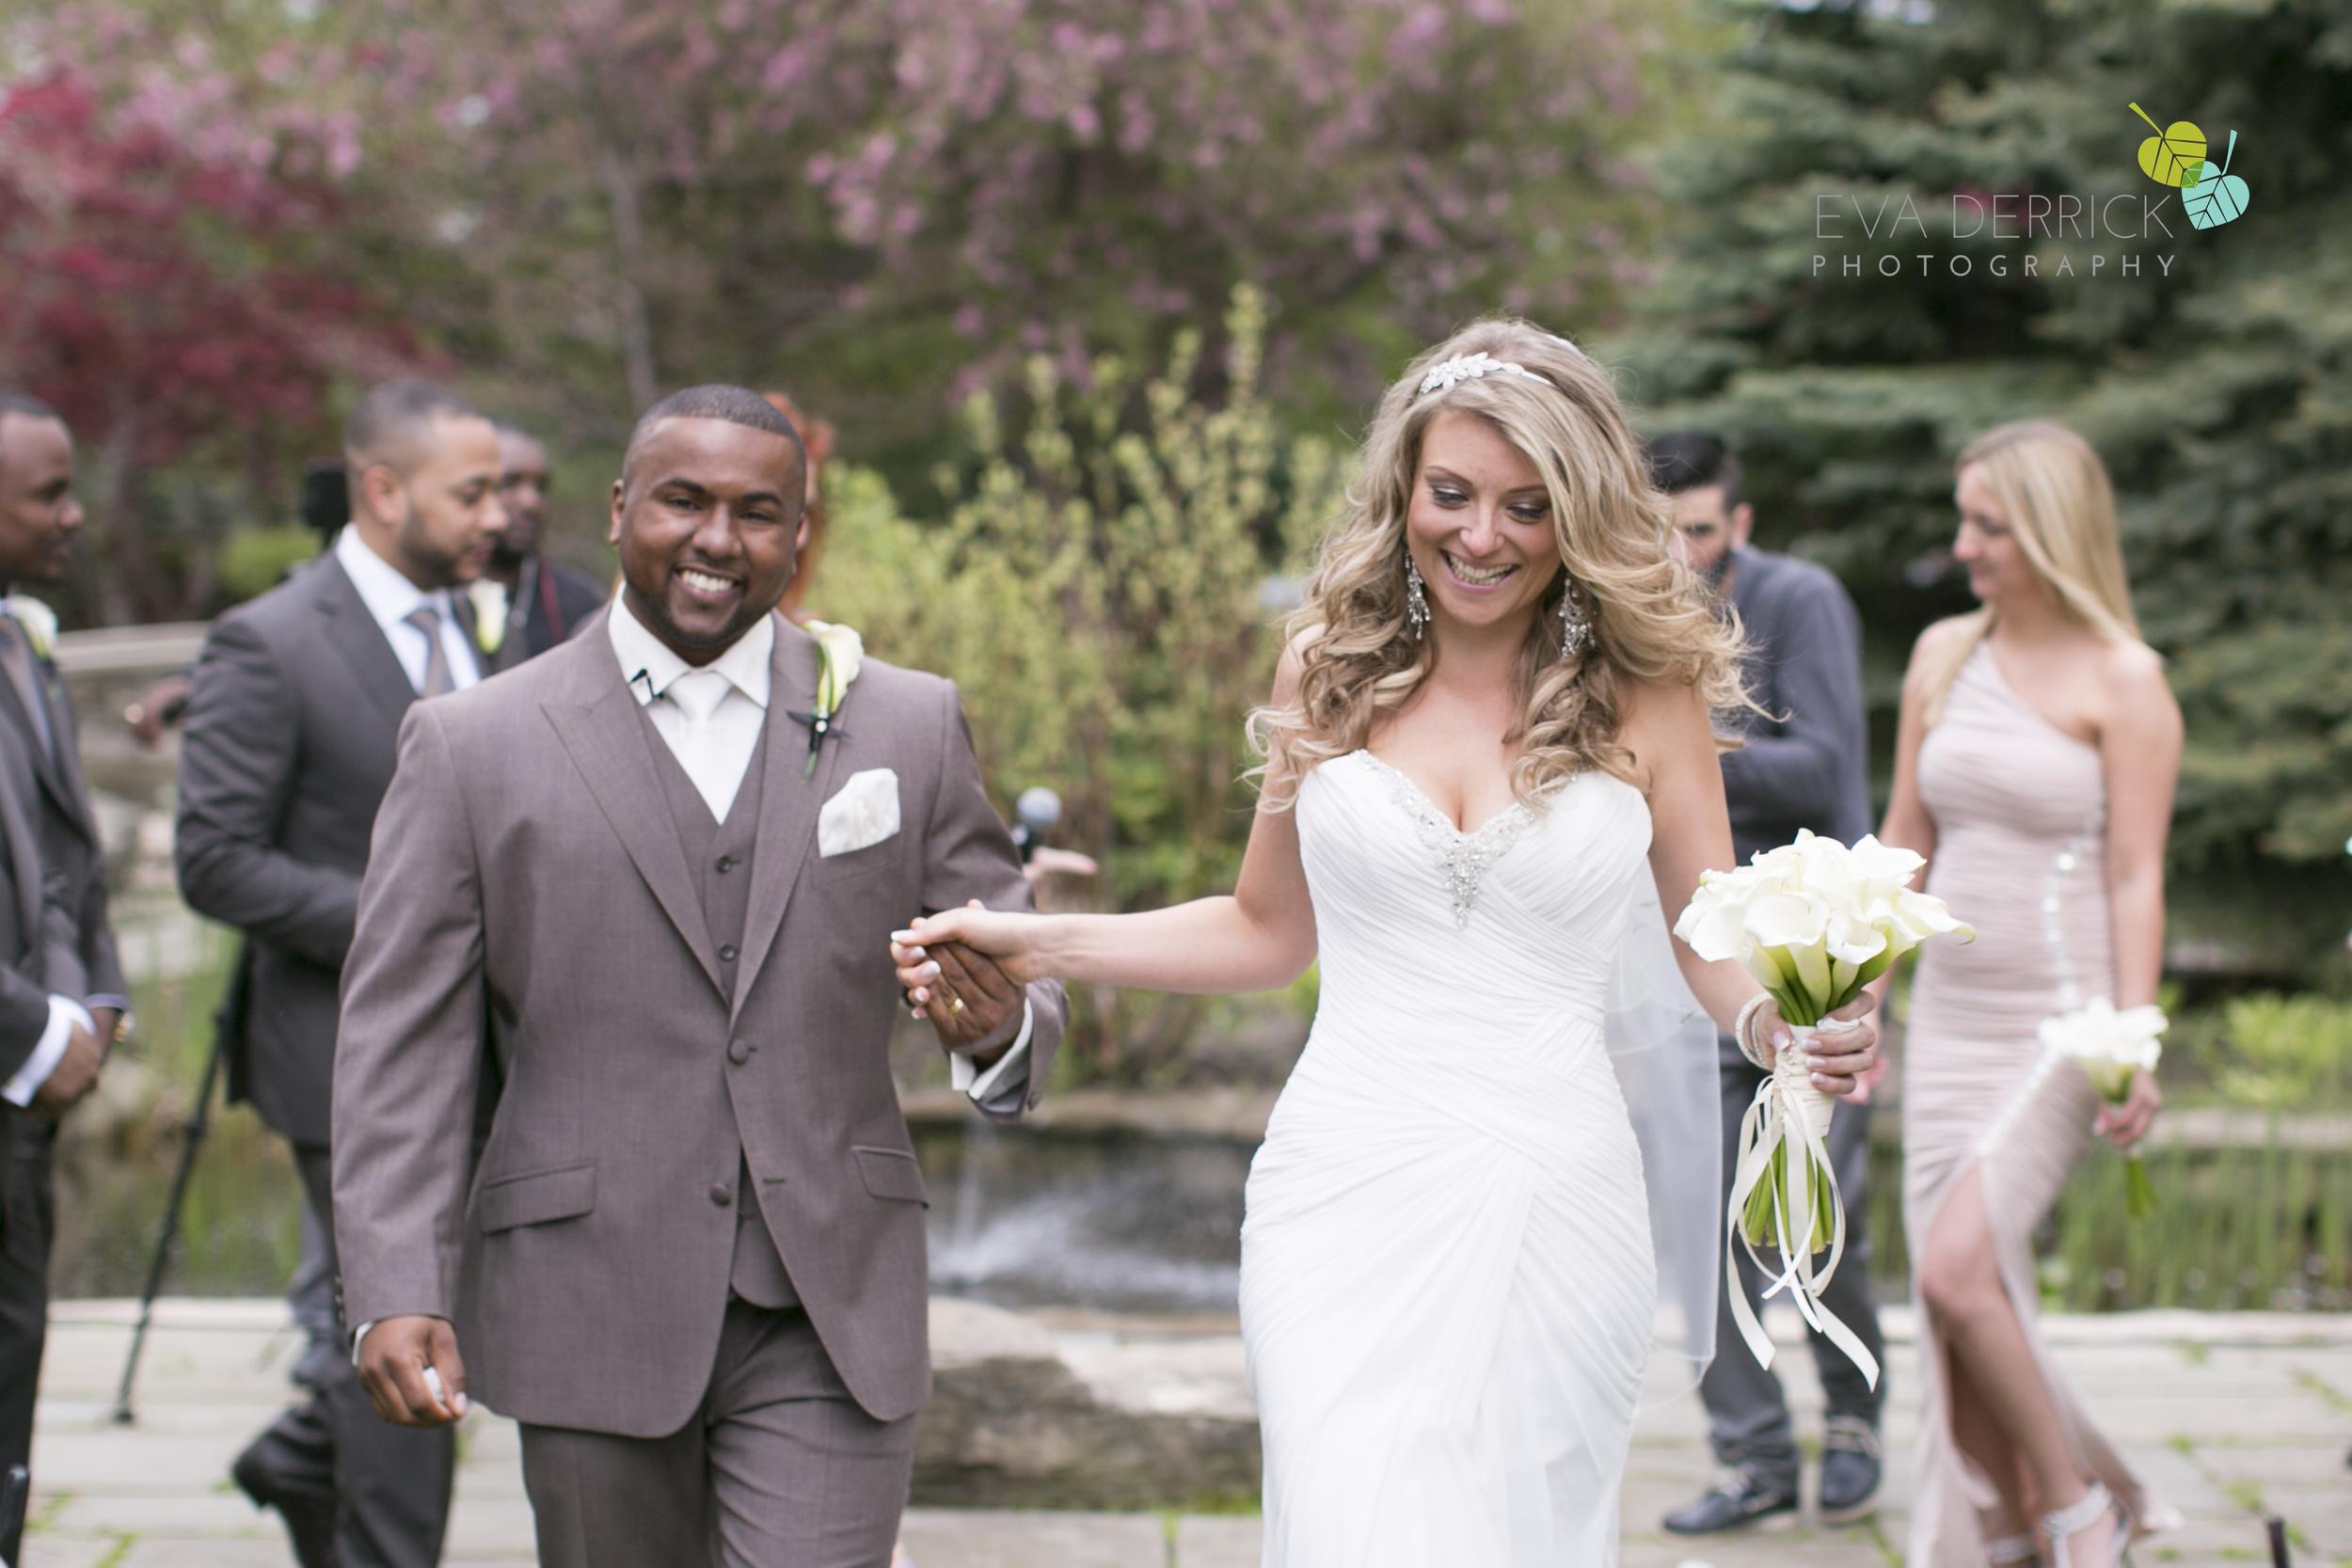 edp_wedding_jenna_chris-0157.jpg